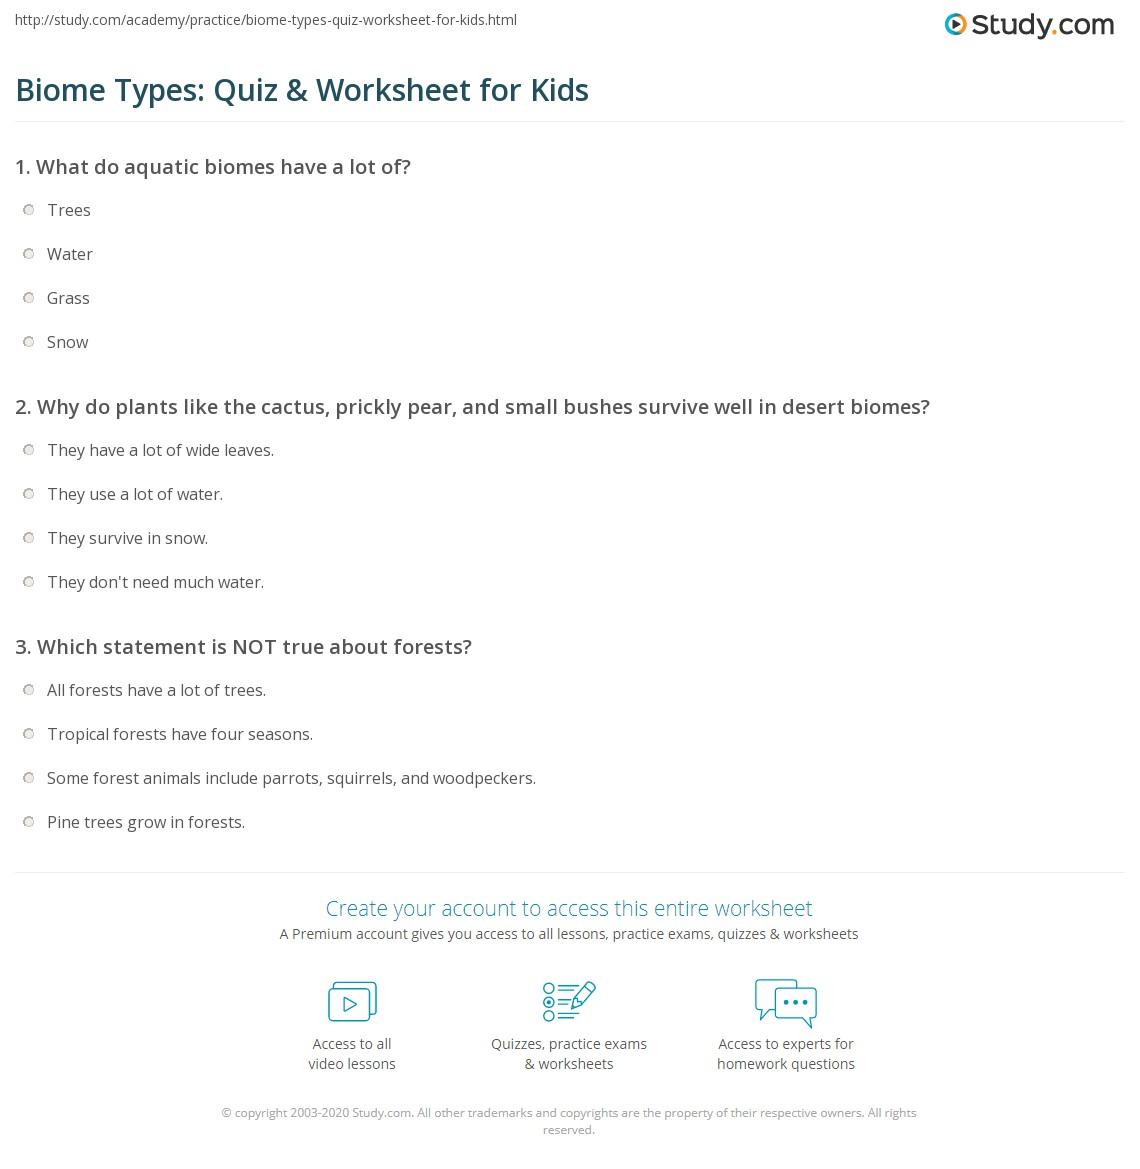 Biome Types Quiz Amp Worksheet For Kids